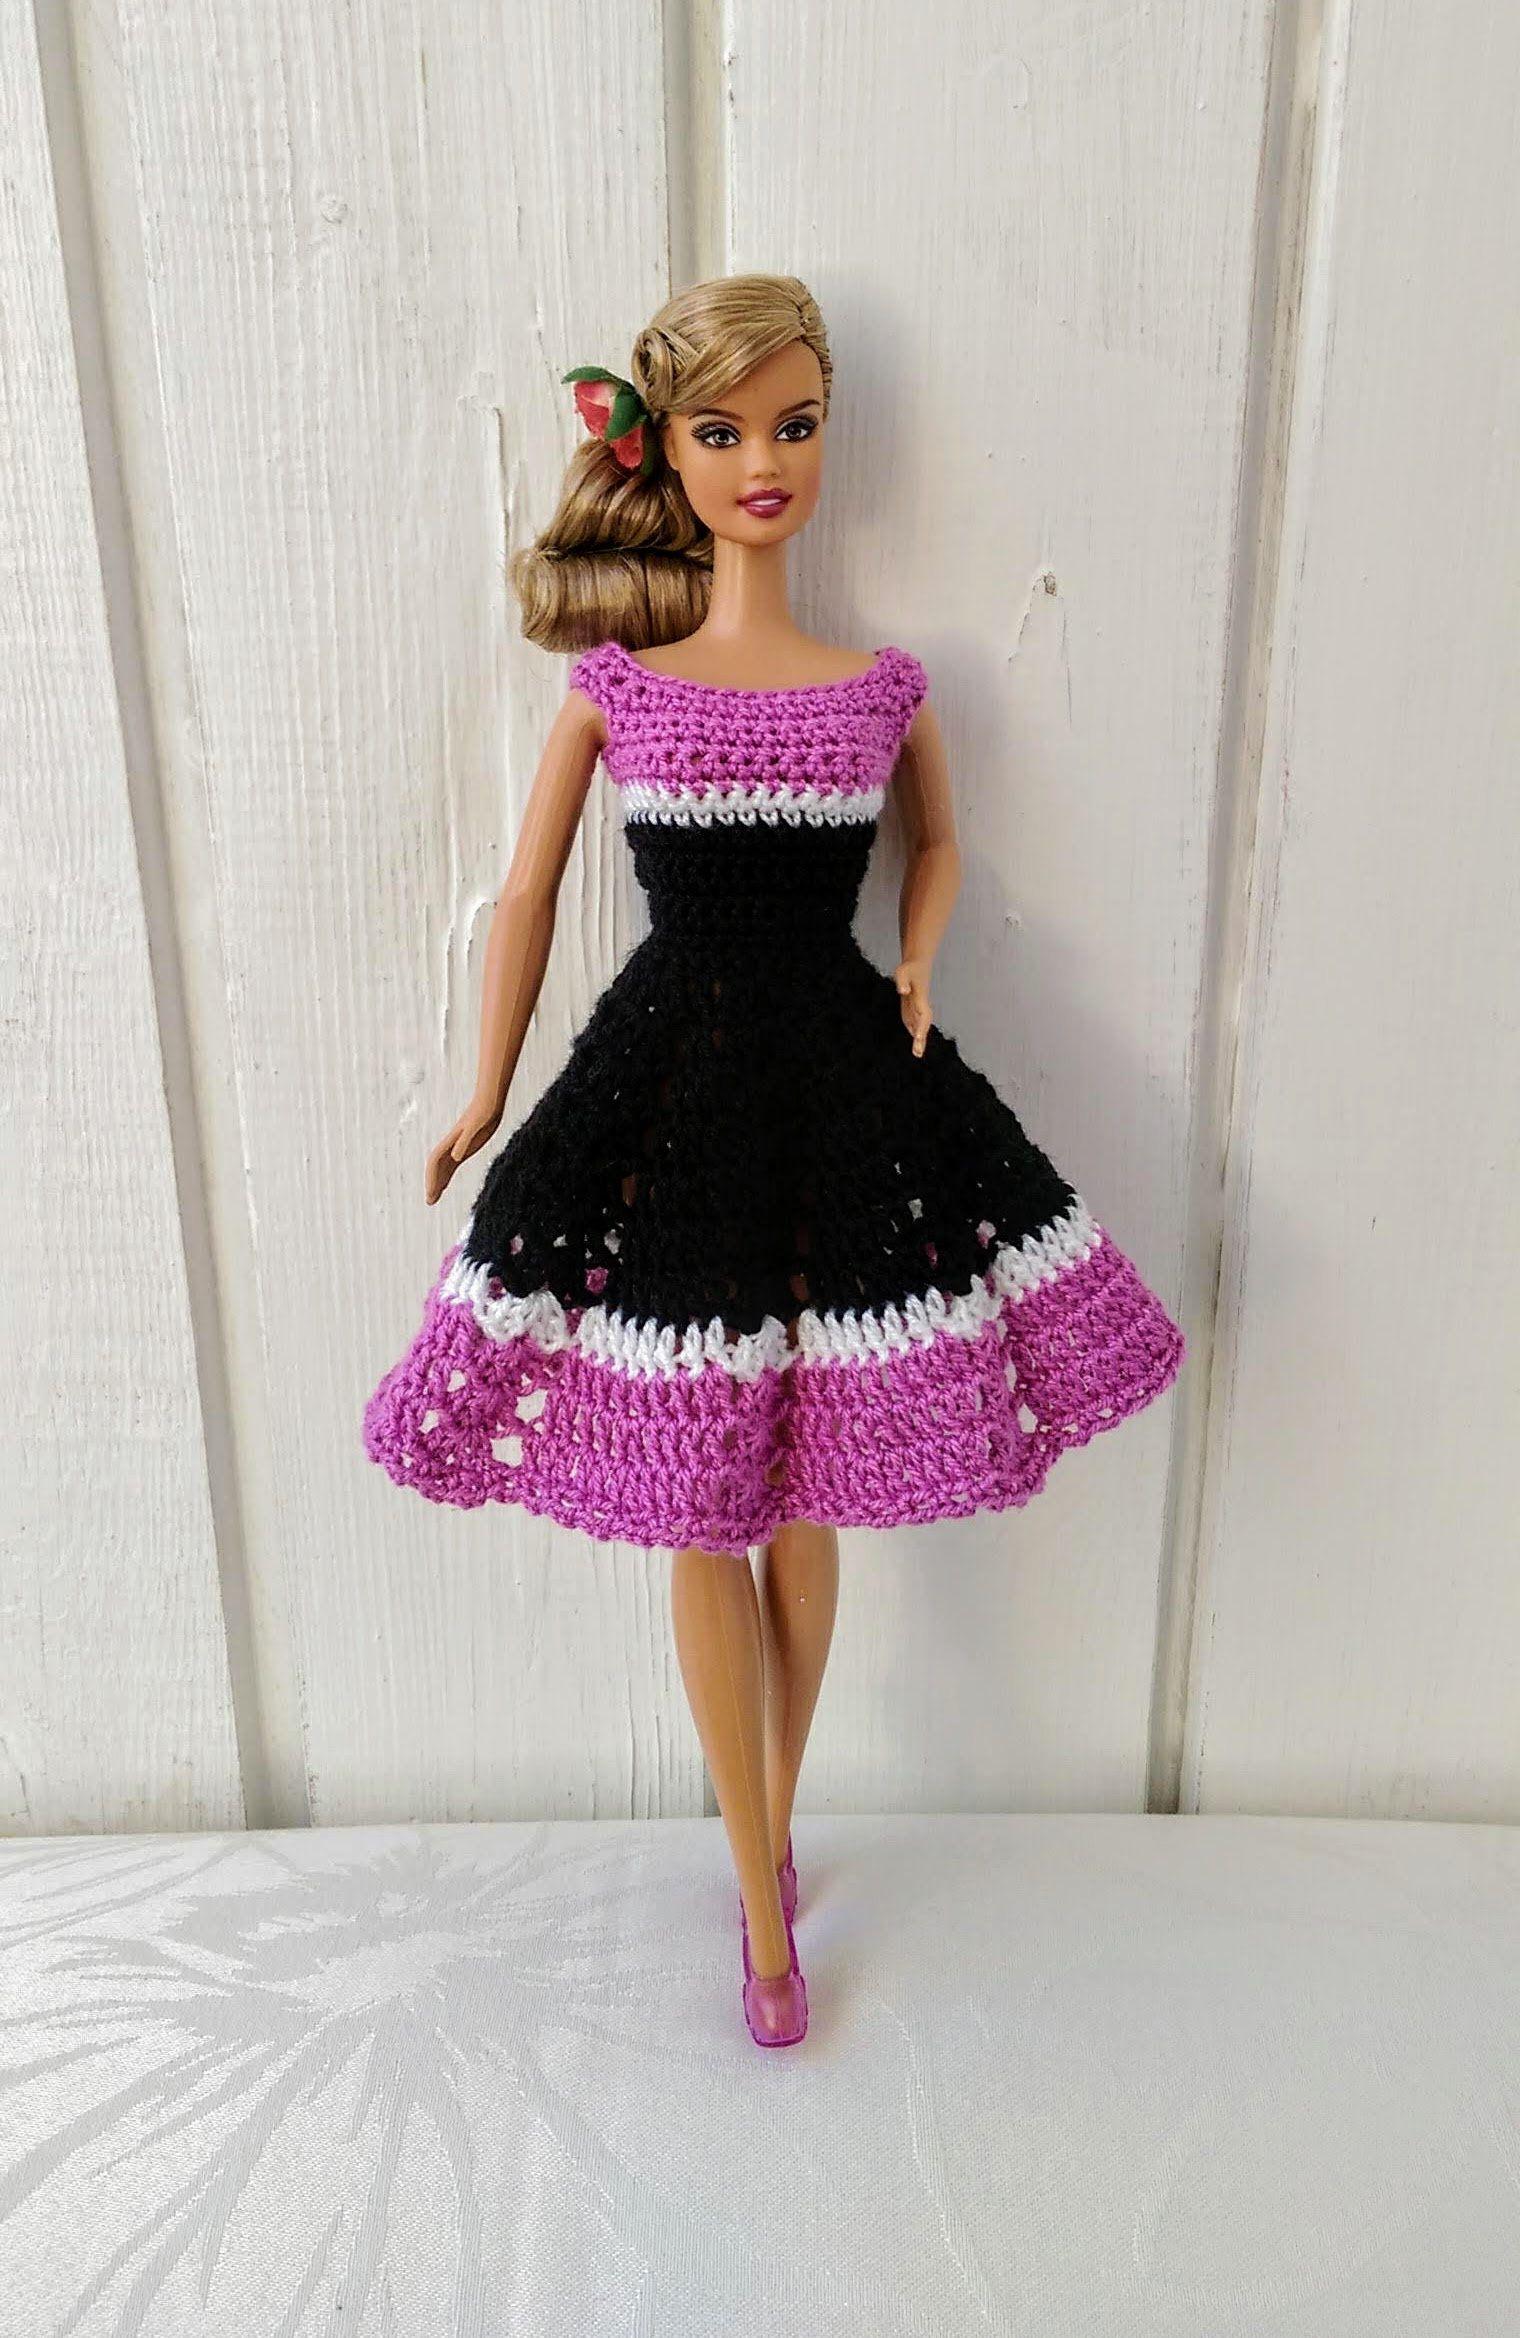 Barbie clothes Barbie Crochet Dress for Barbie Doll